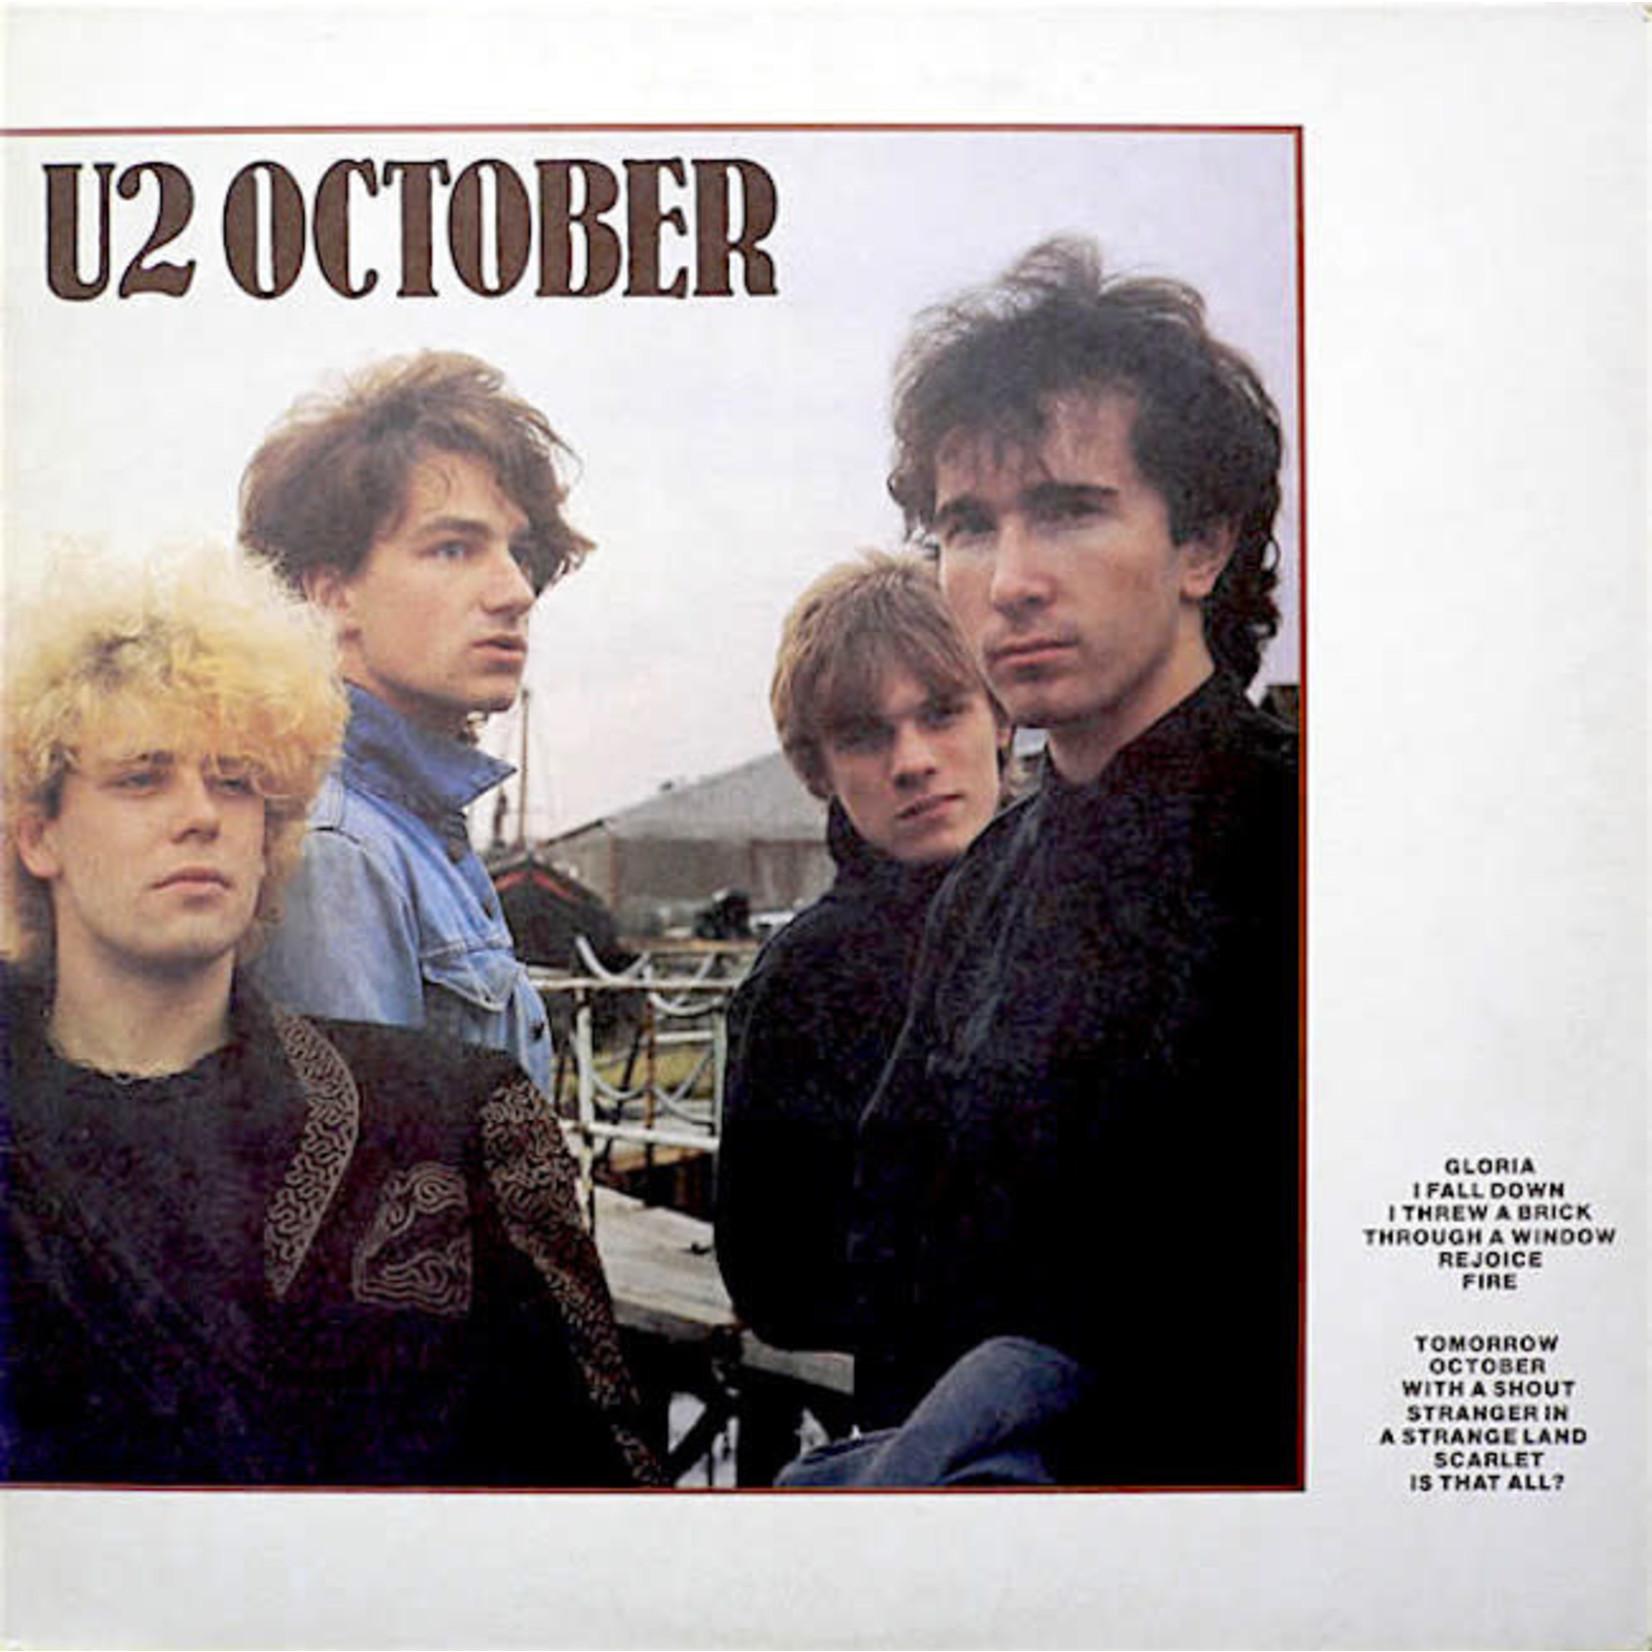 [Vintage] U2: October